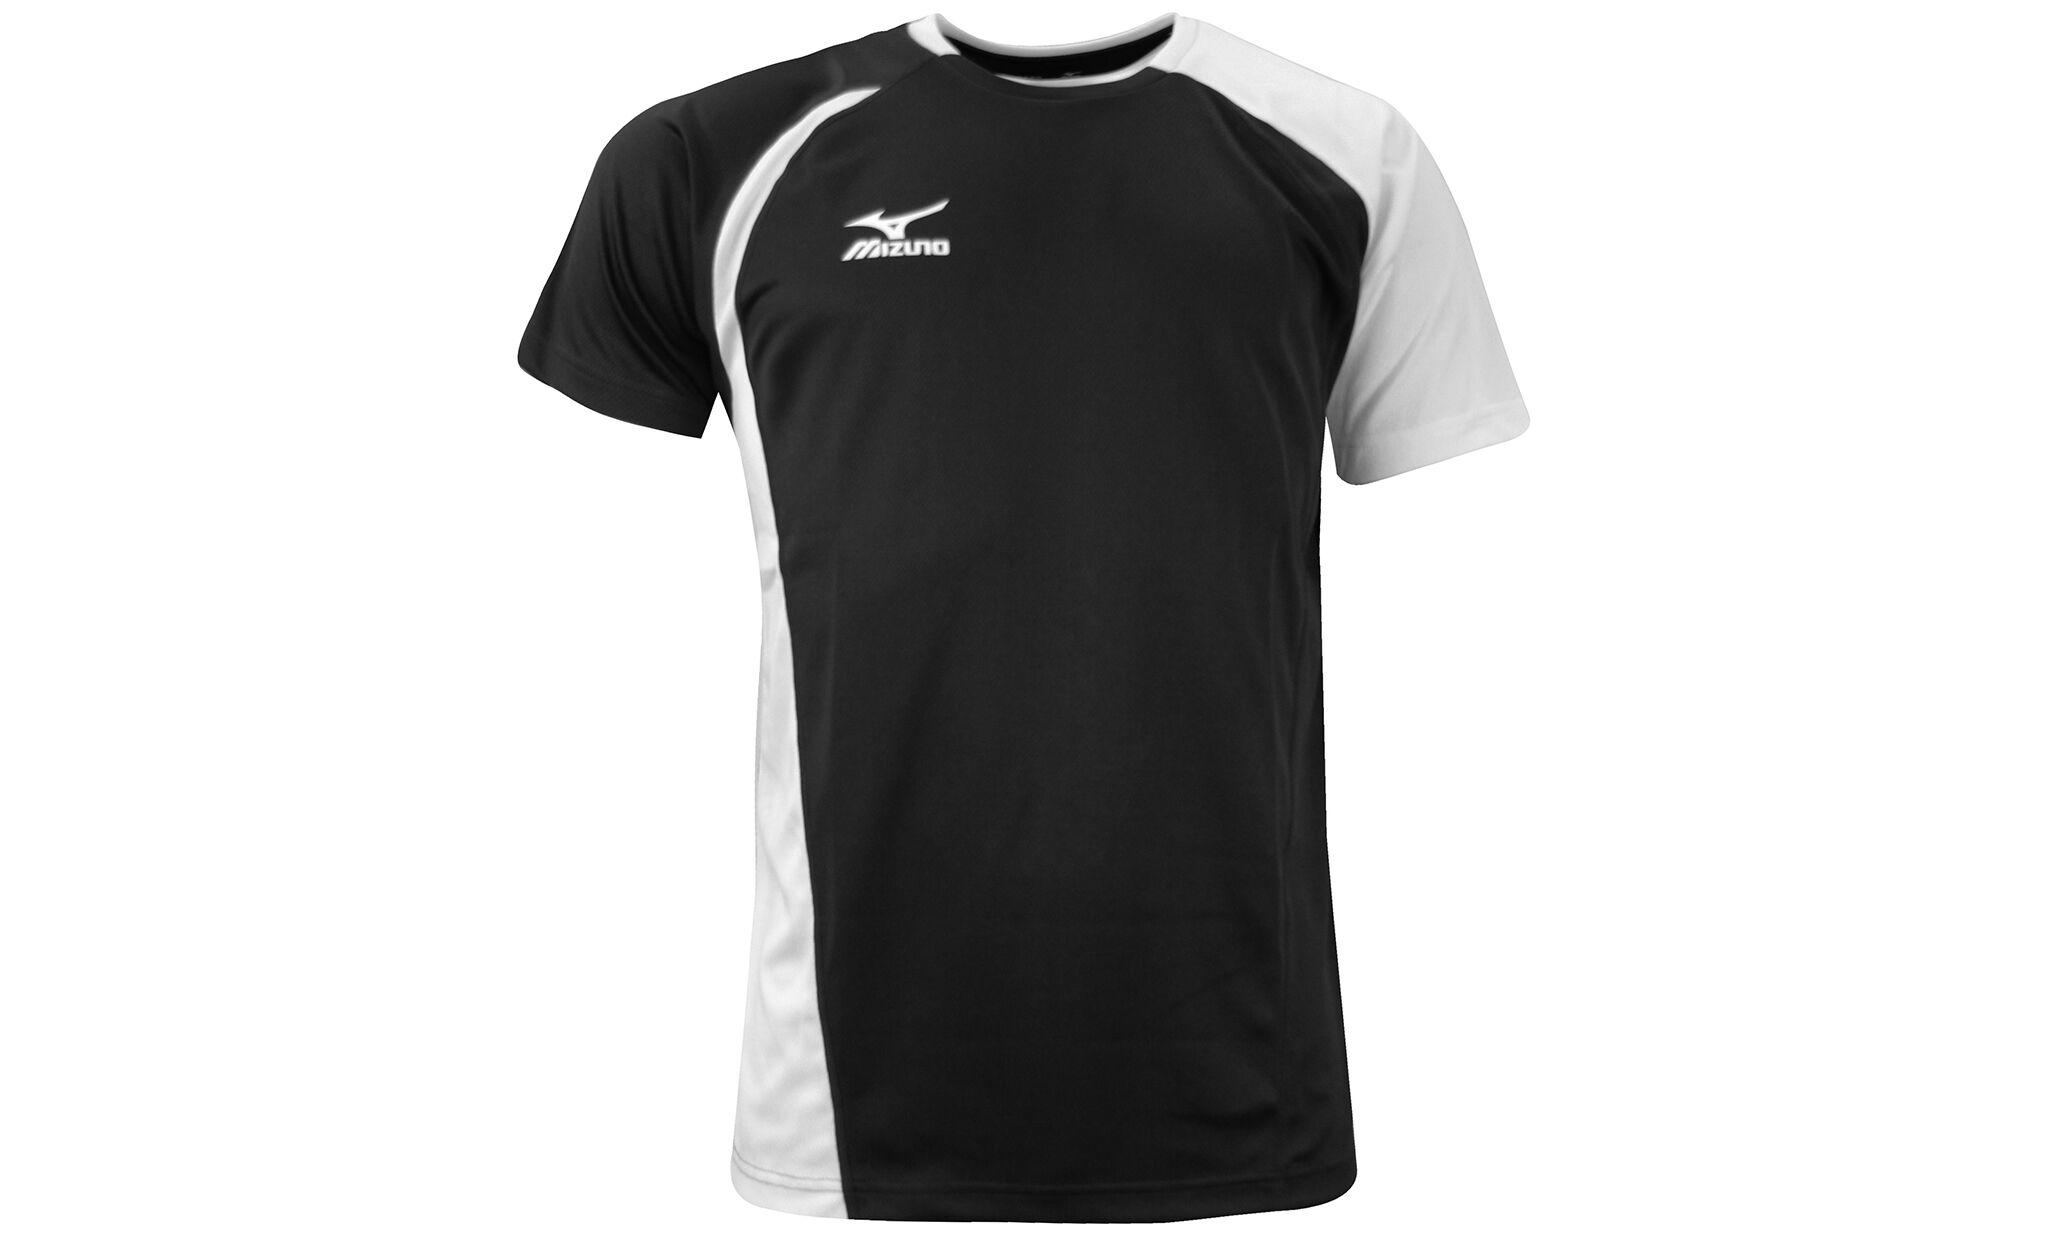 Mizuno Men's Mizuno Takeshi Tech T-Shirt: Black / Size M